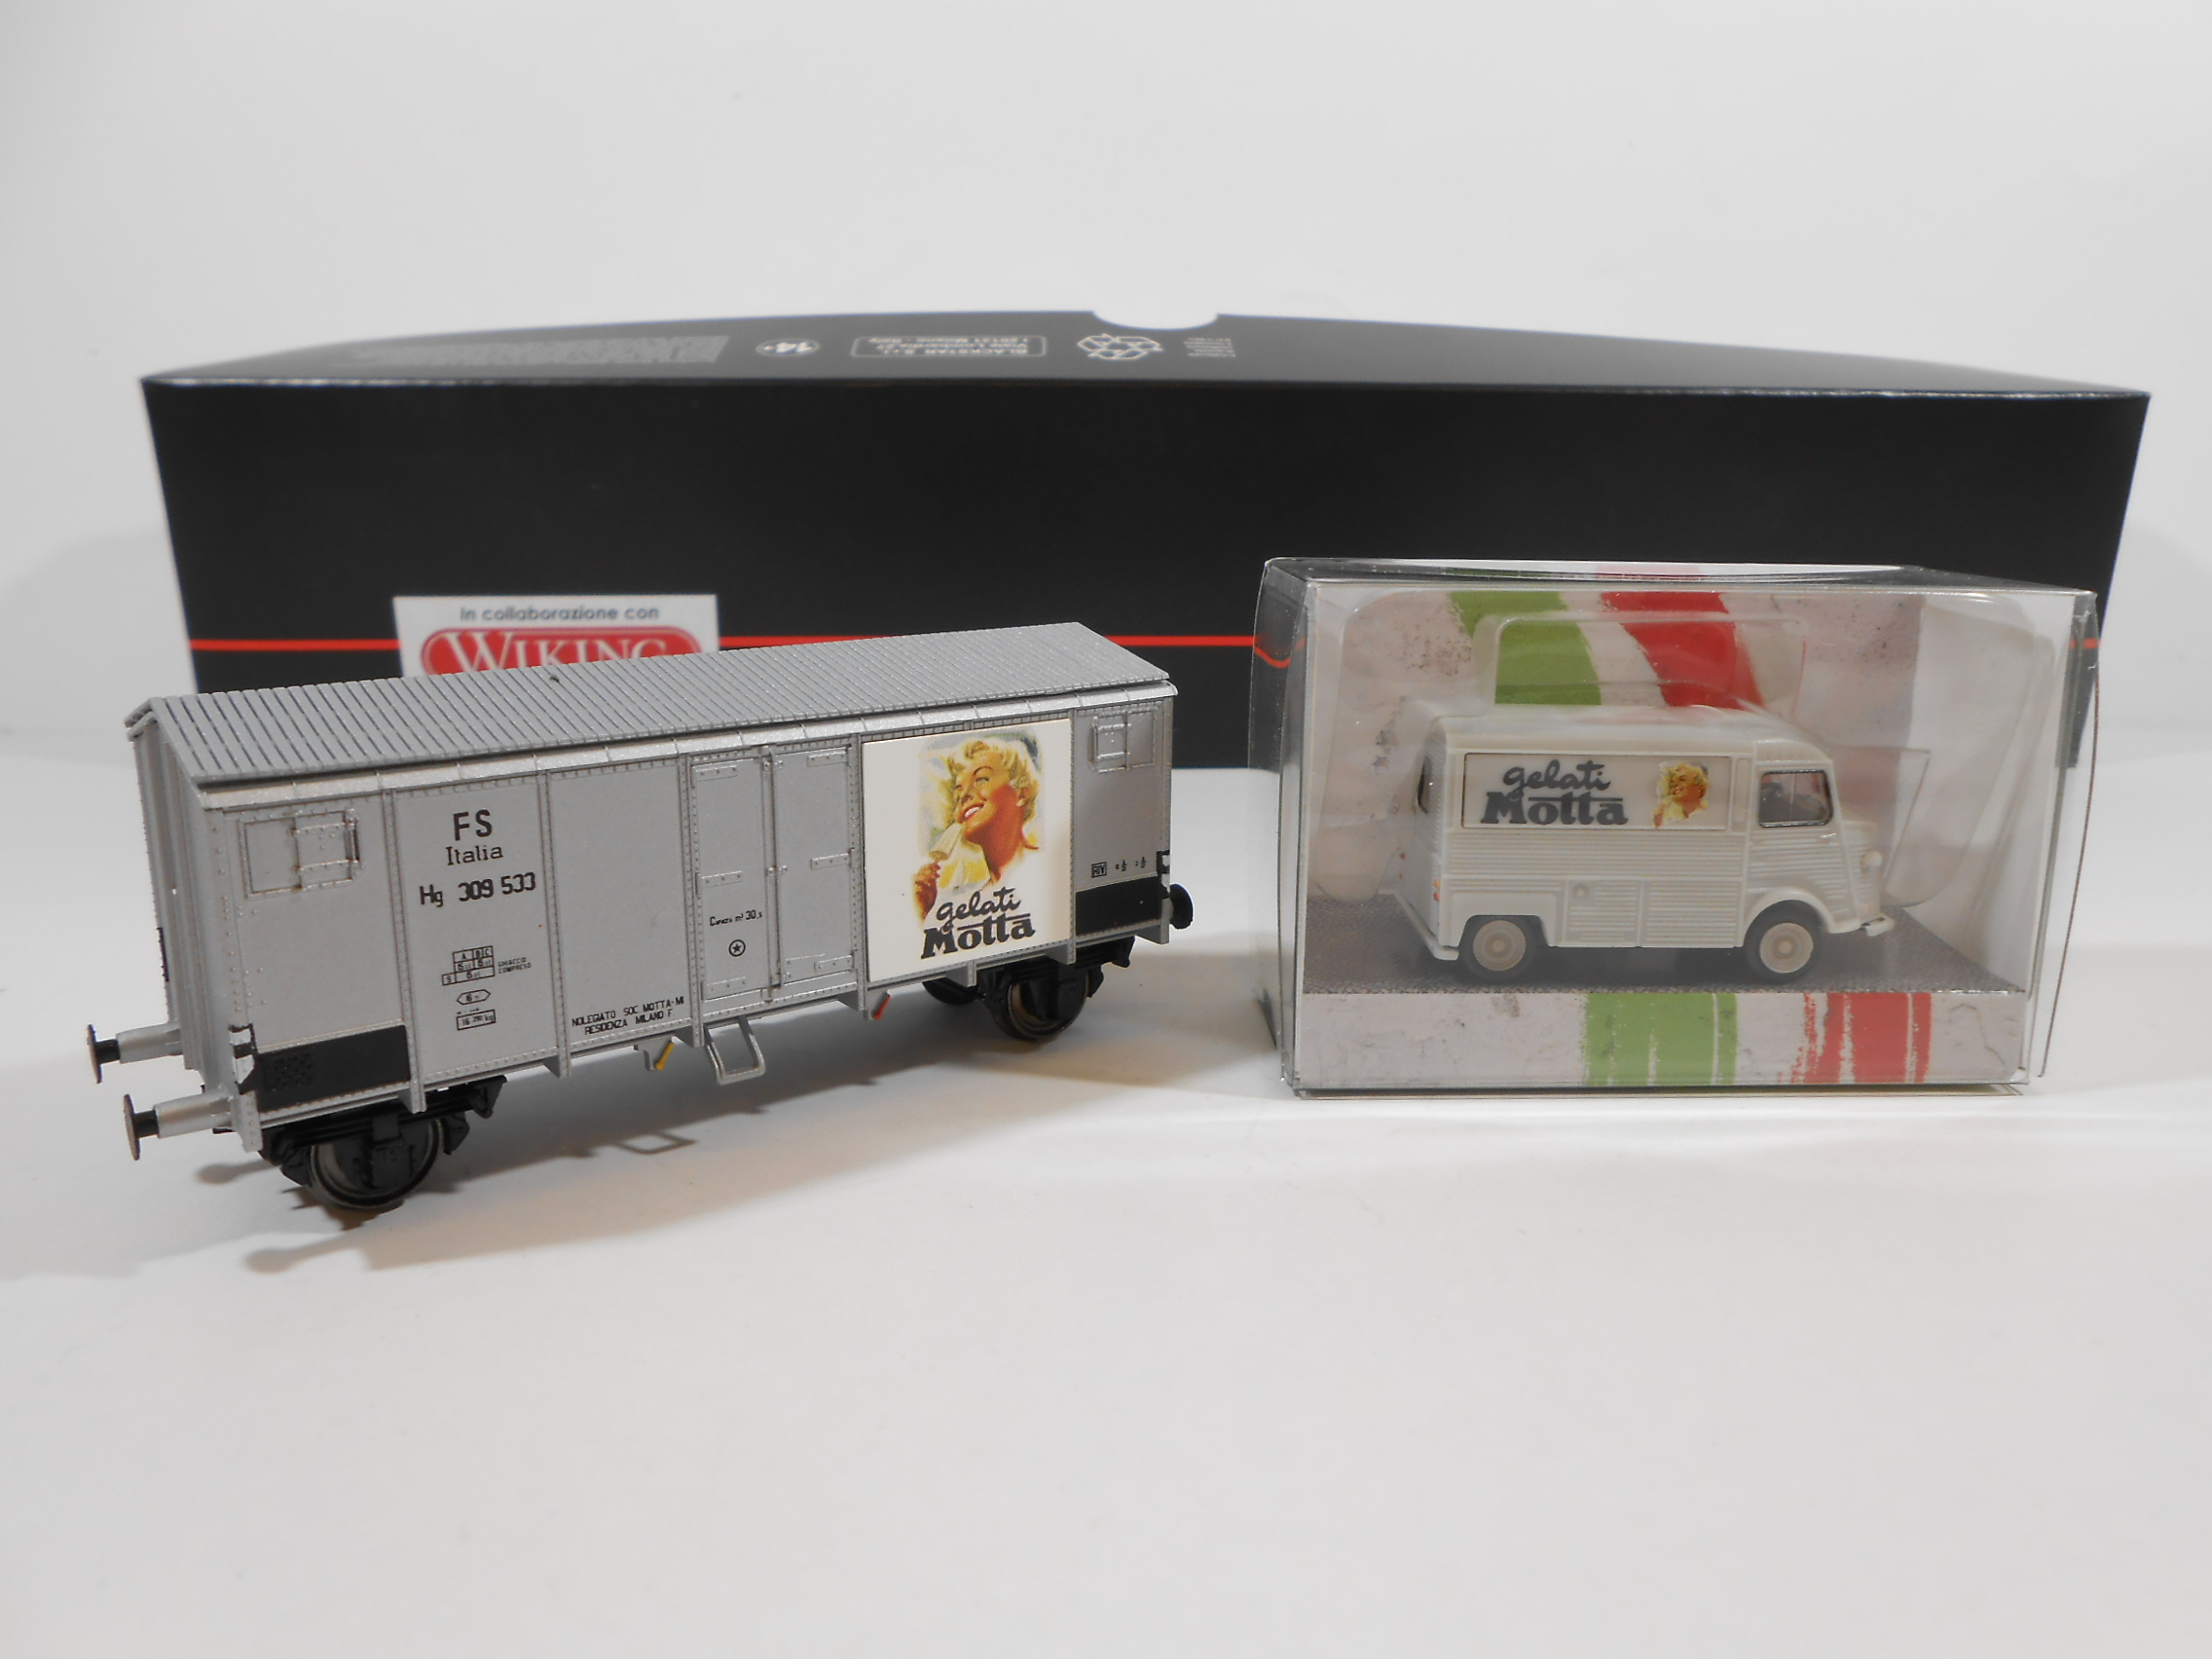 BLACKSTAR BS00021 - Set Motta con carro tipo Hg e furgone Citroen H